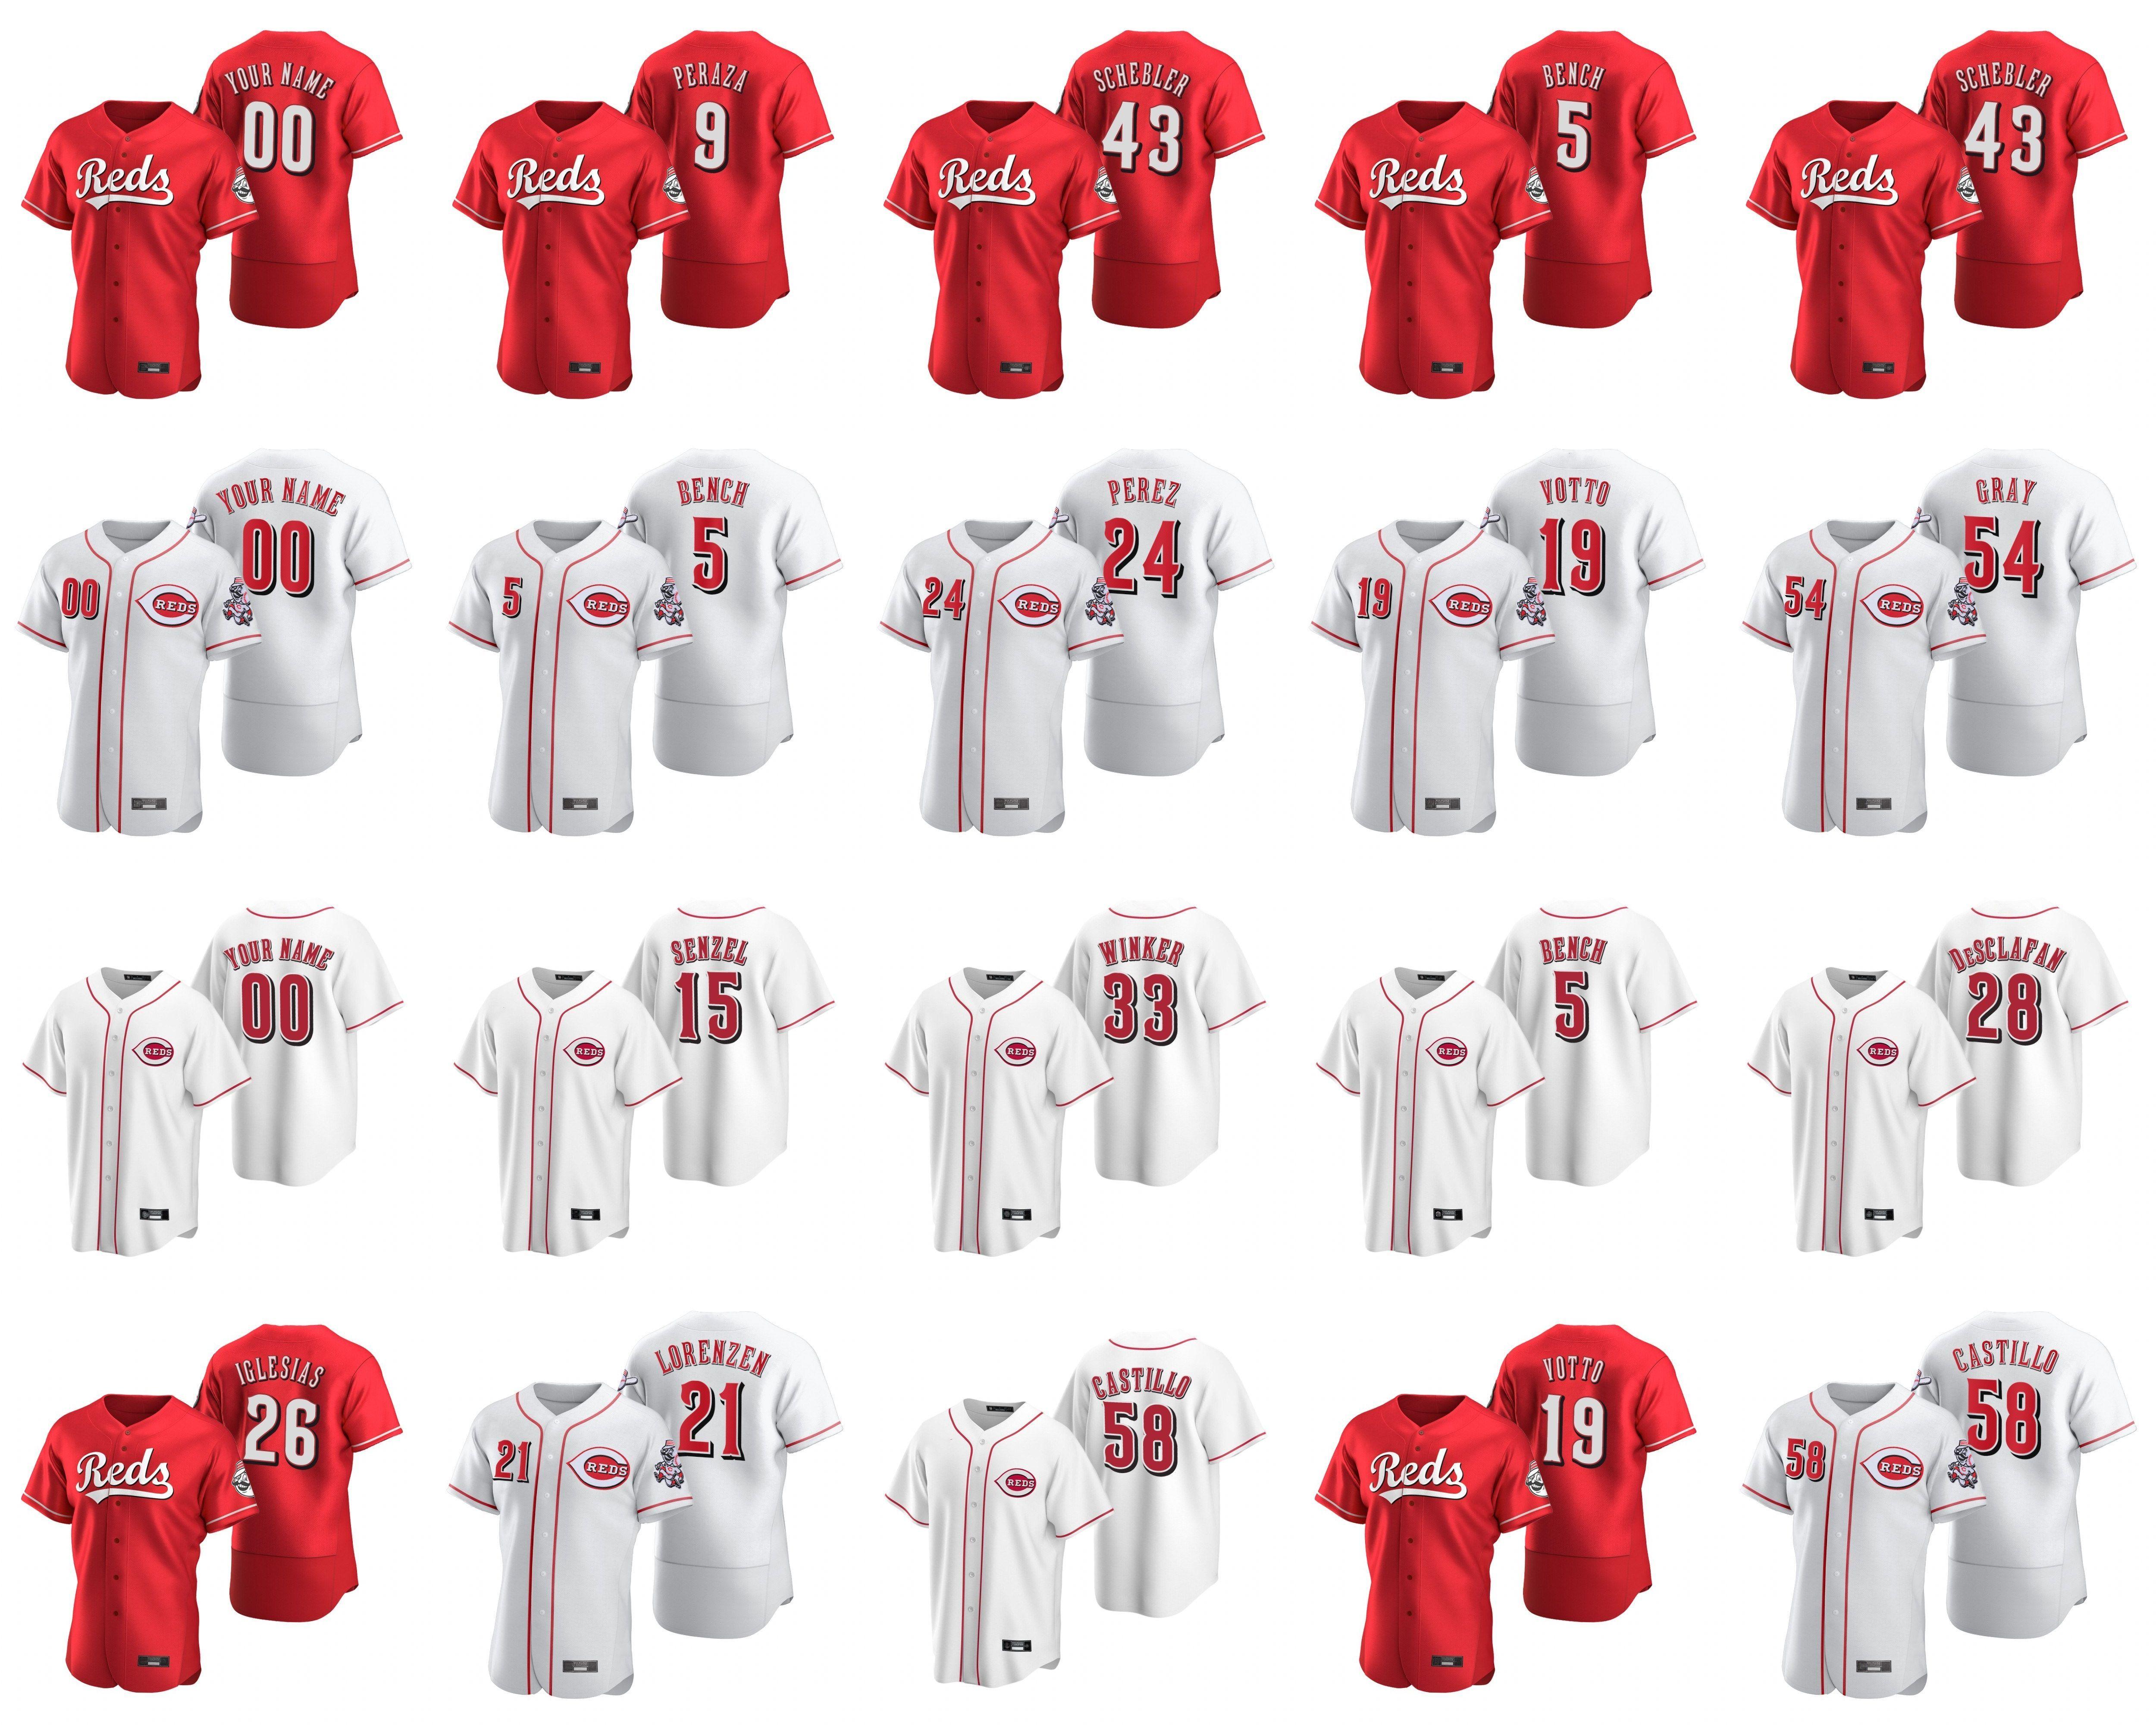 2020 Pedro Strop Jersey Amir Garrett Scott Schebler Anthony DeSclafani Ken Griffey Jr Eugenio Suarez Kırmızı Beyzbol Formalar Özel Dikişli